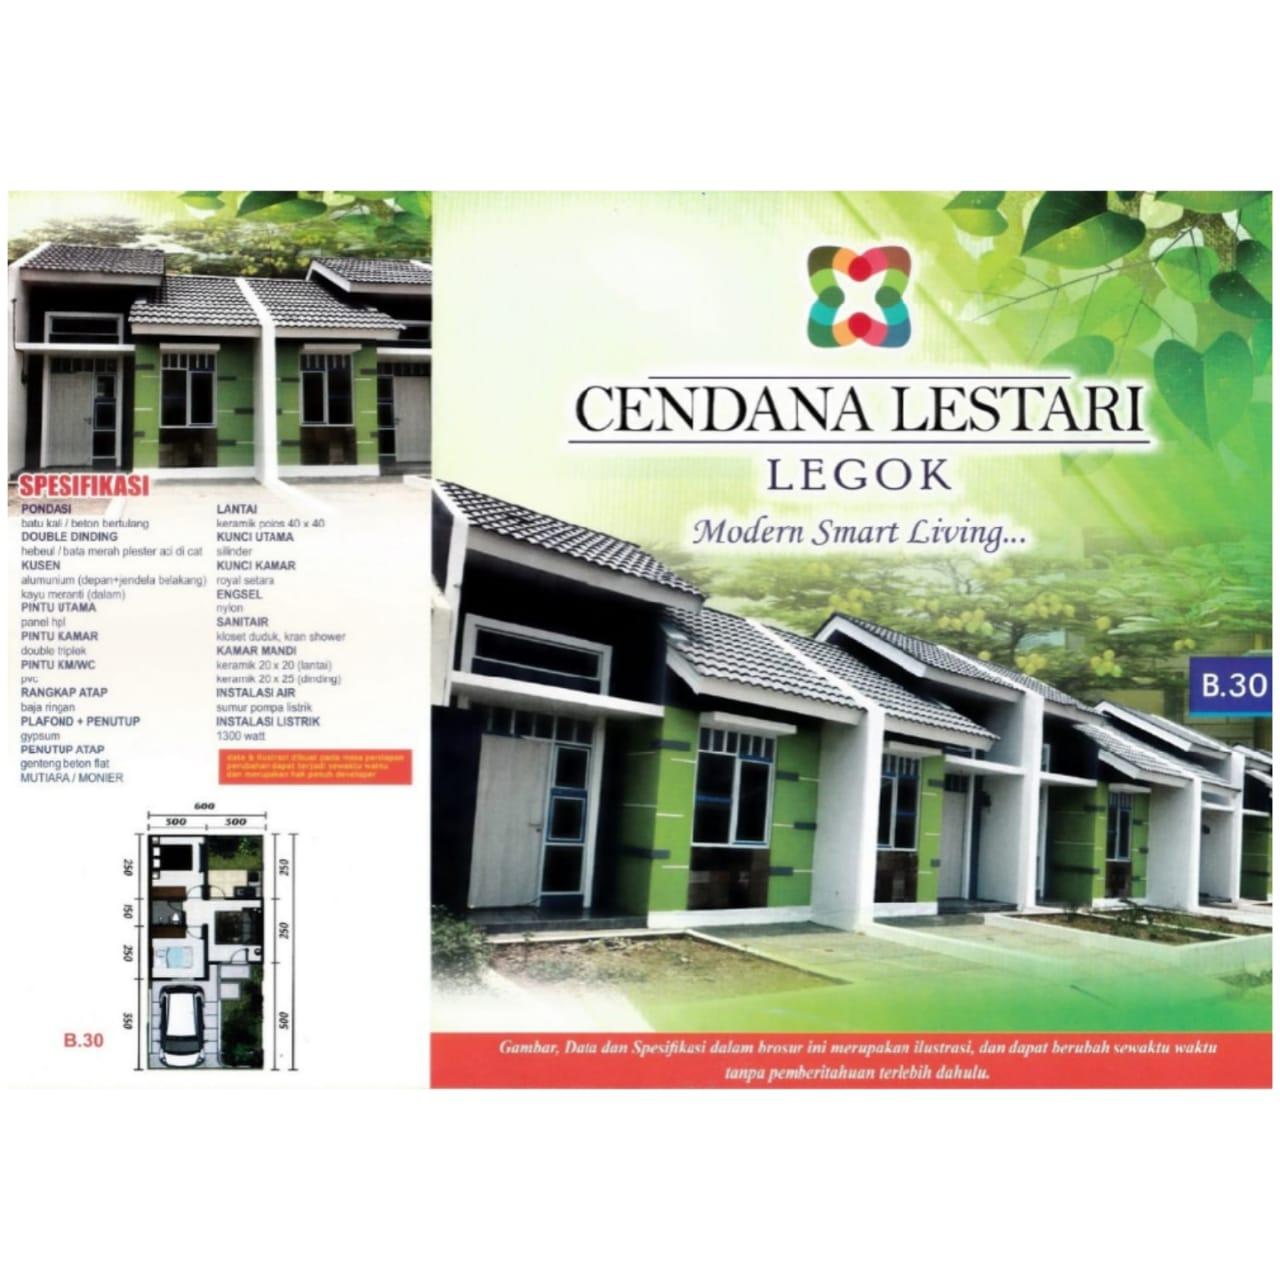 Rumah Idaman dekat Sumarecon Serpong Legok Tangerang